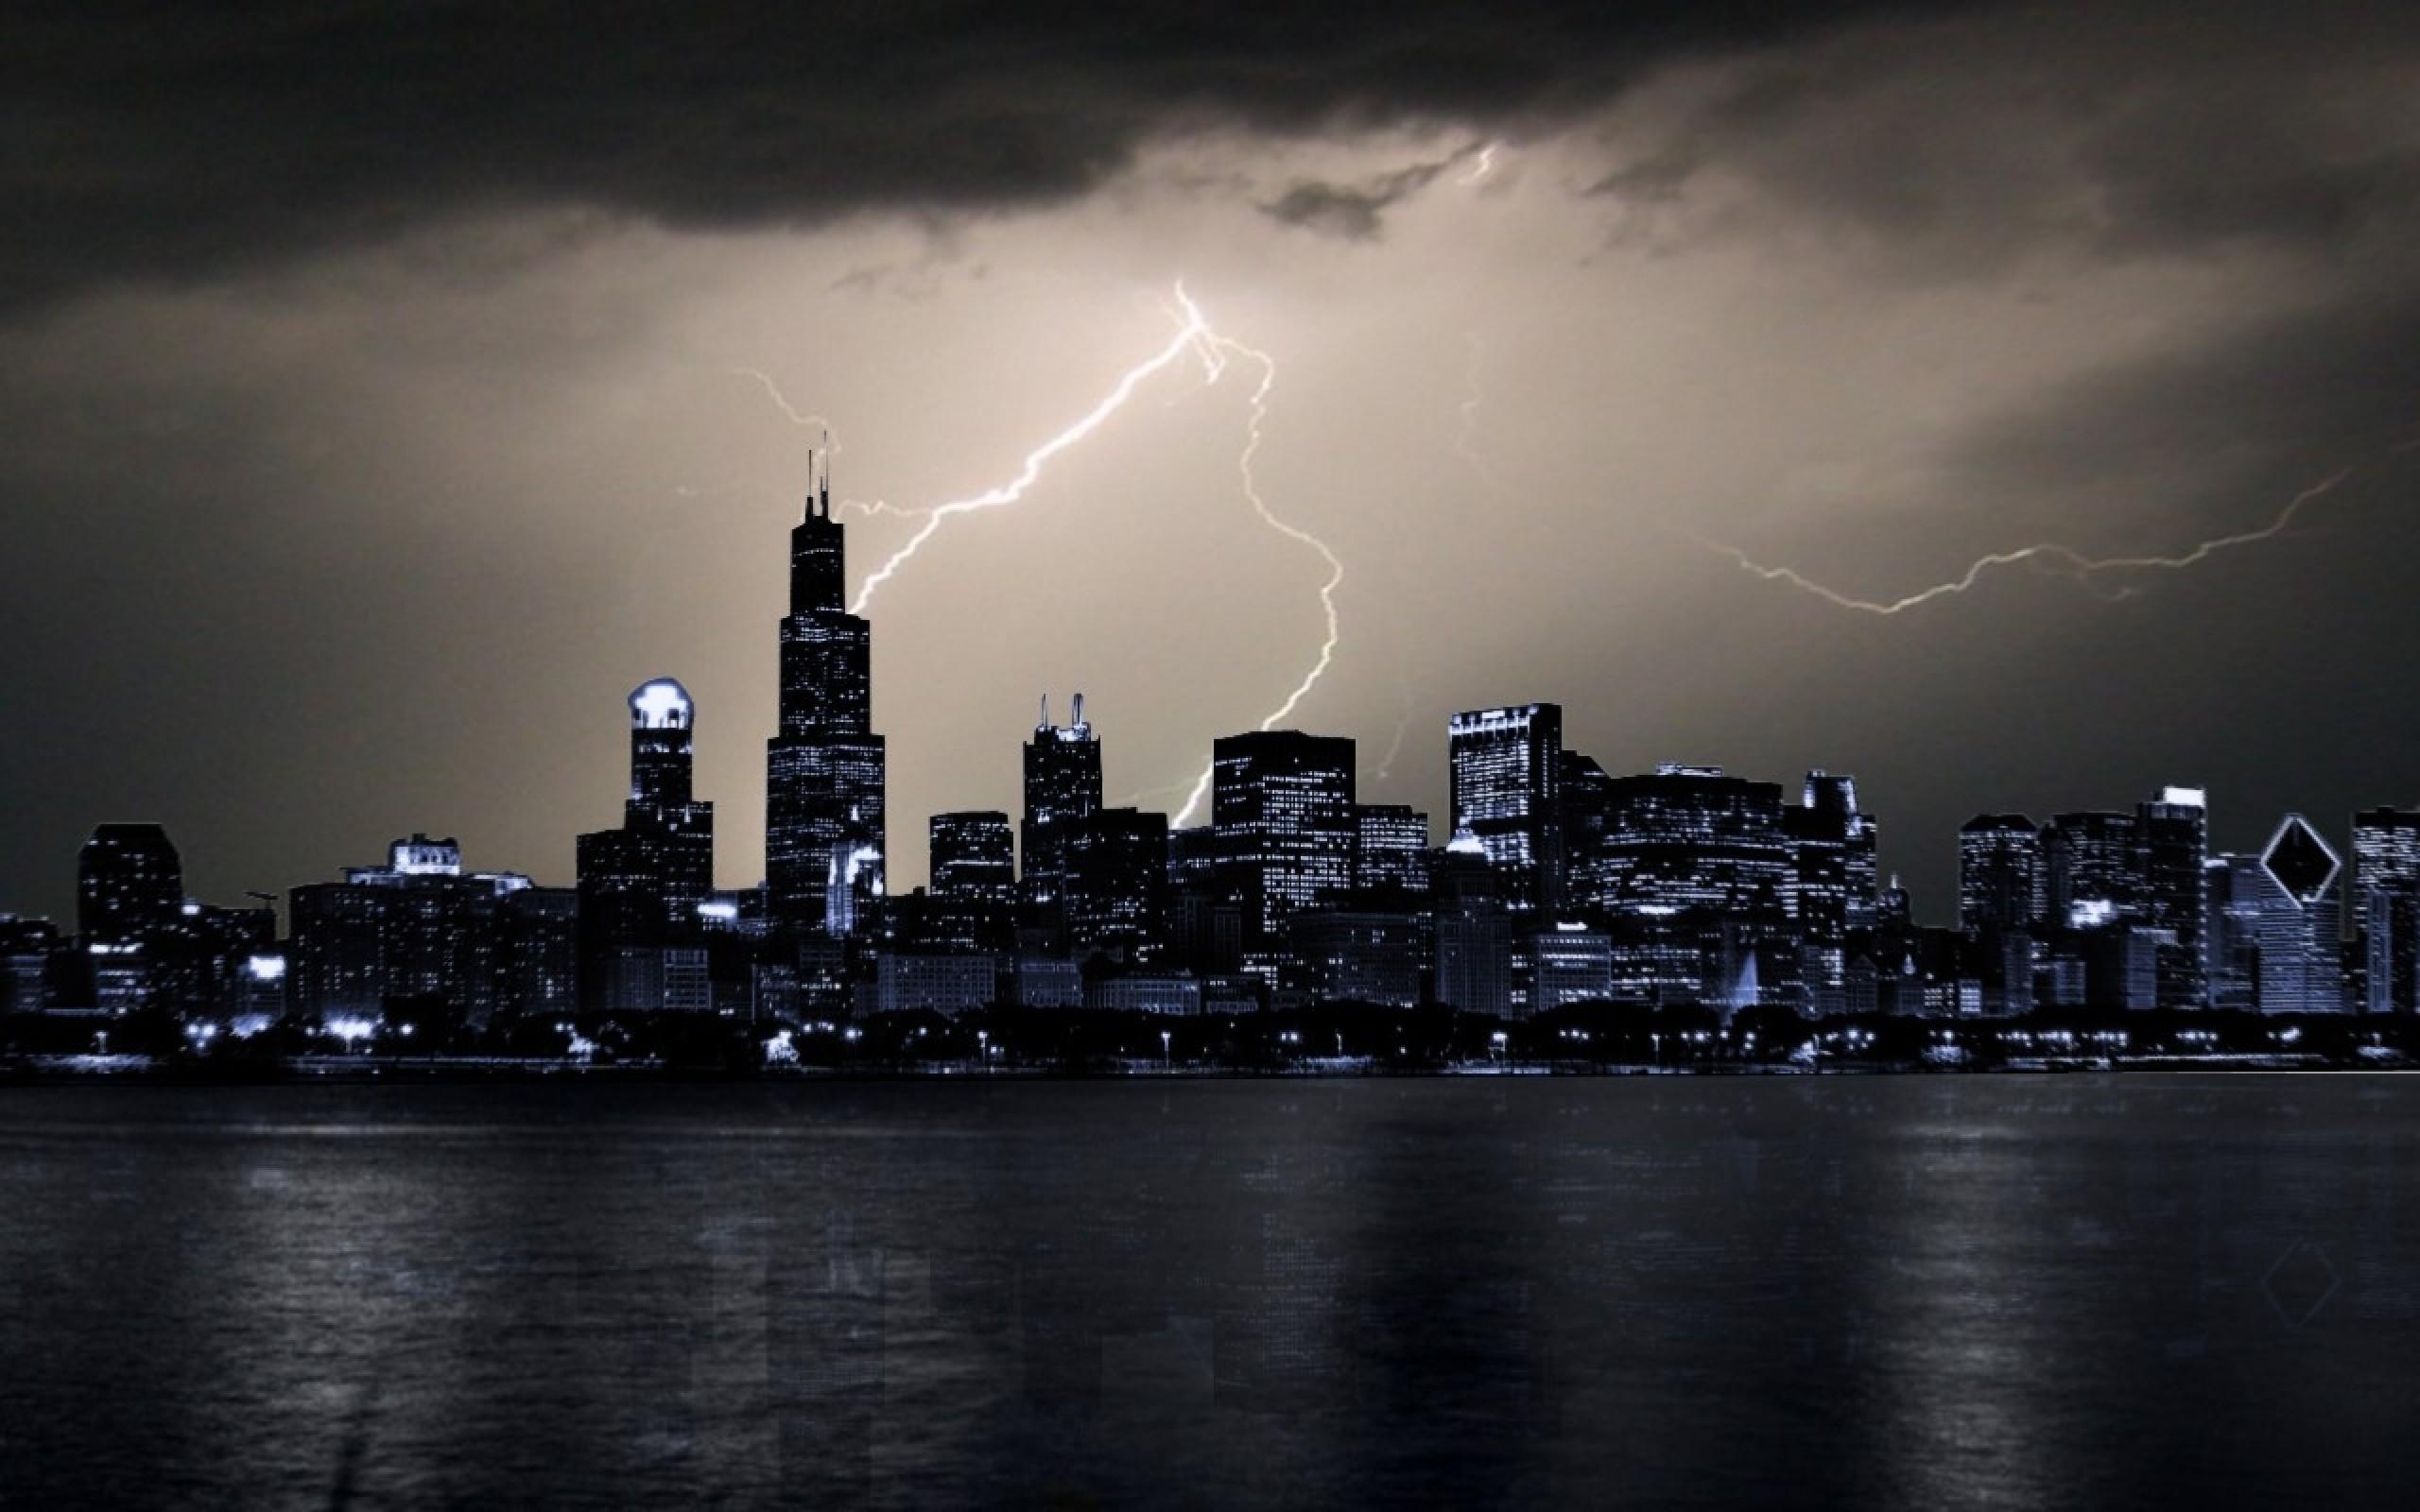 chicago rain storm lightning cities Wallpaper HD